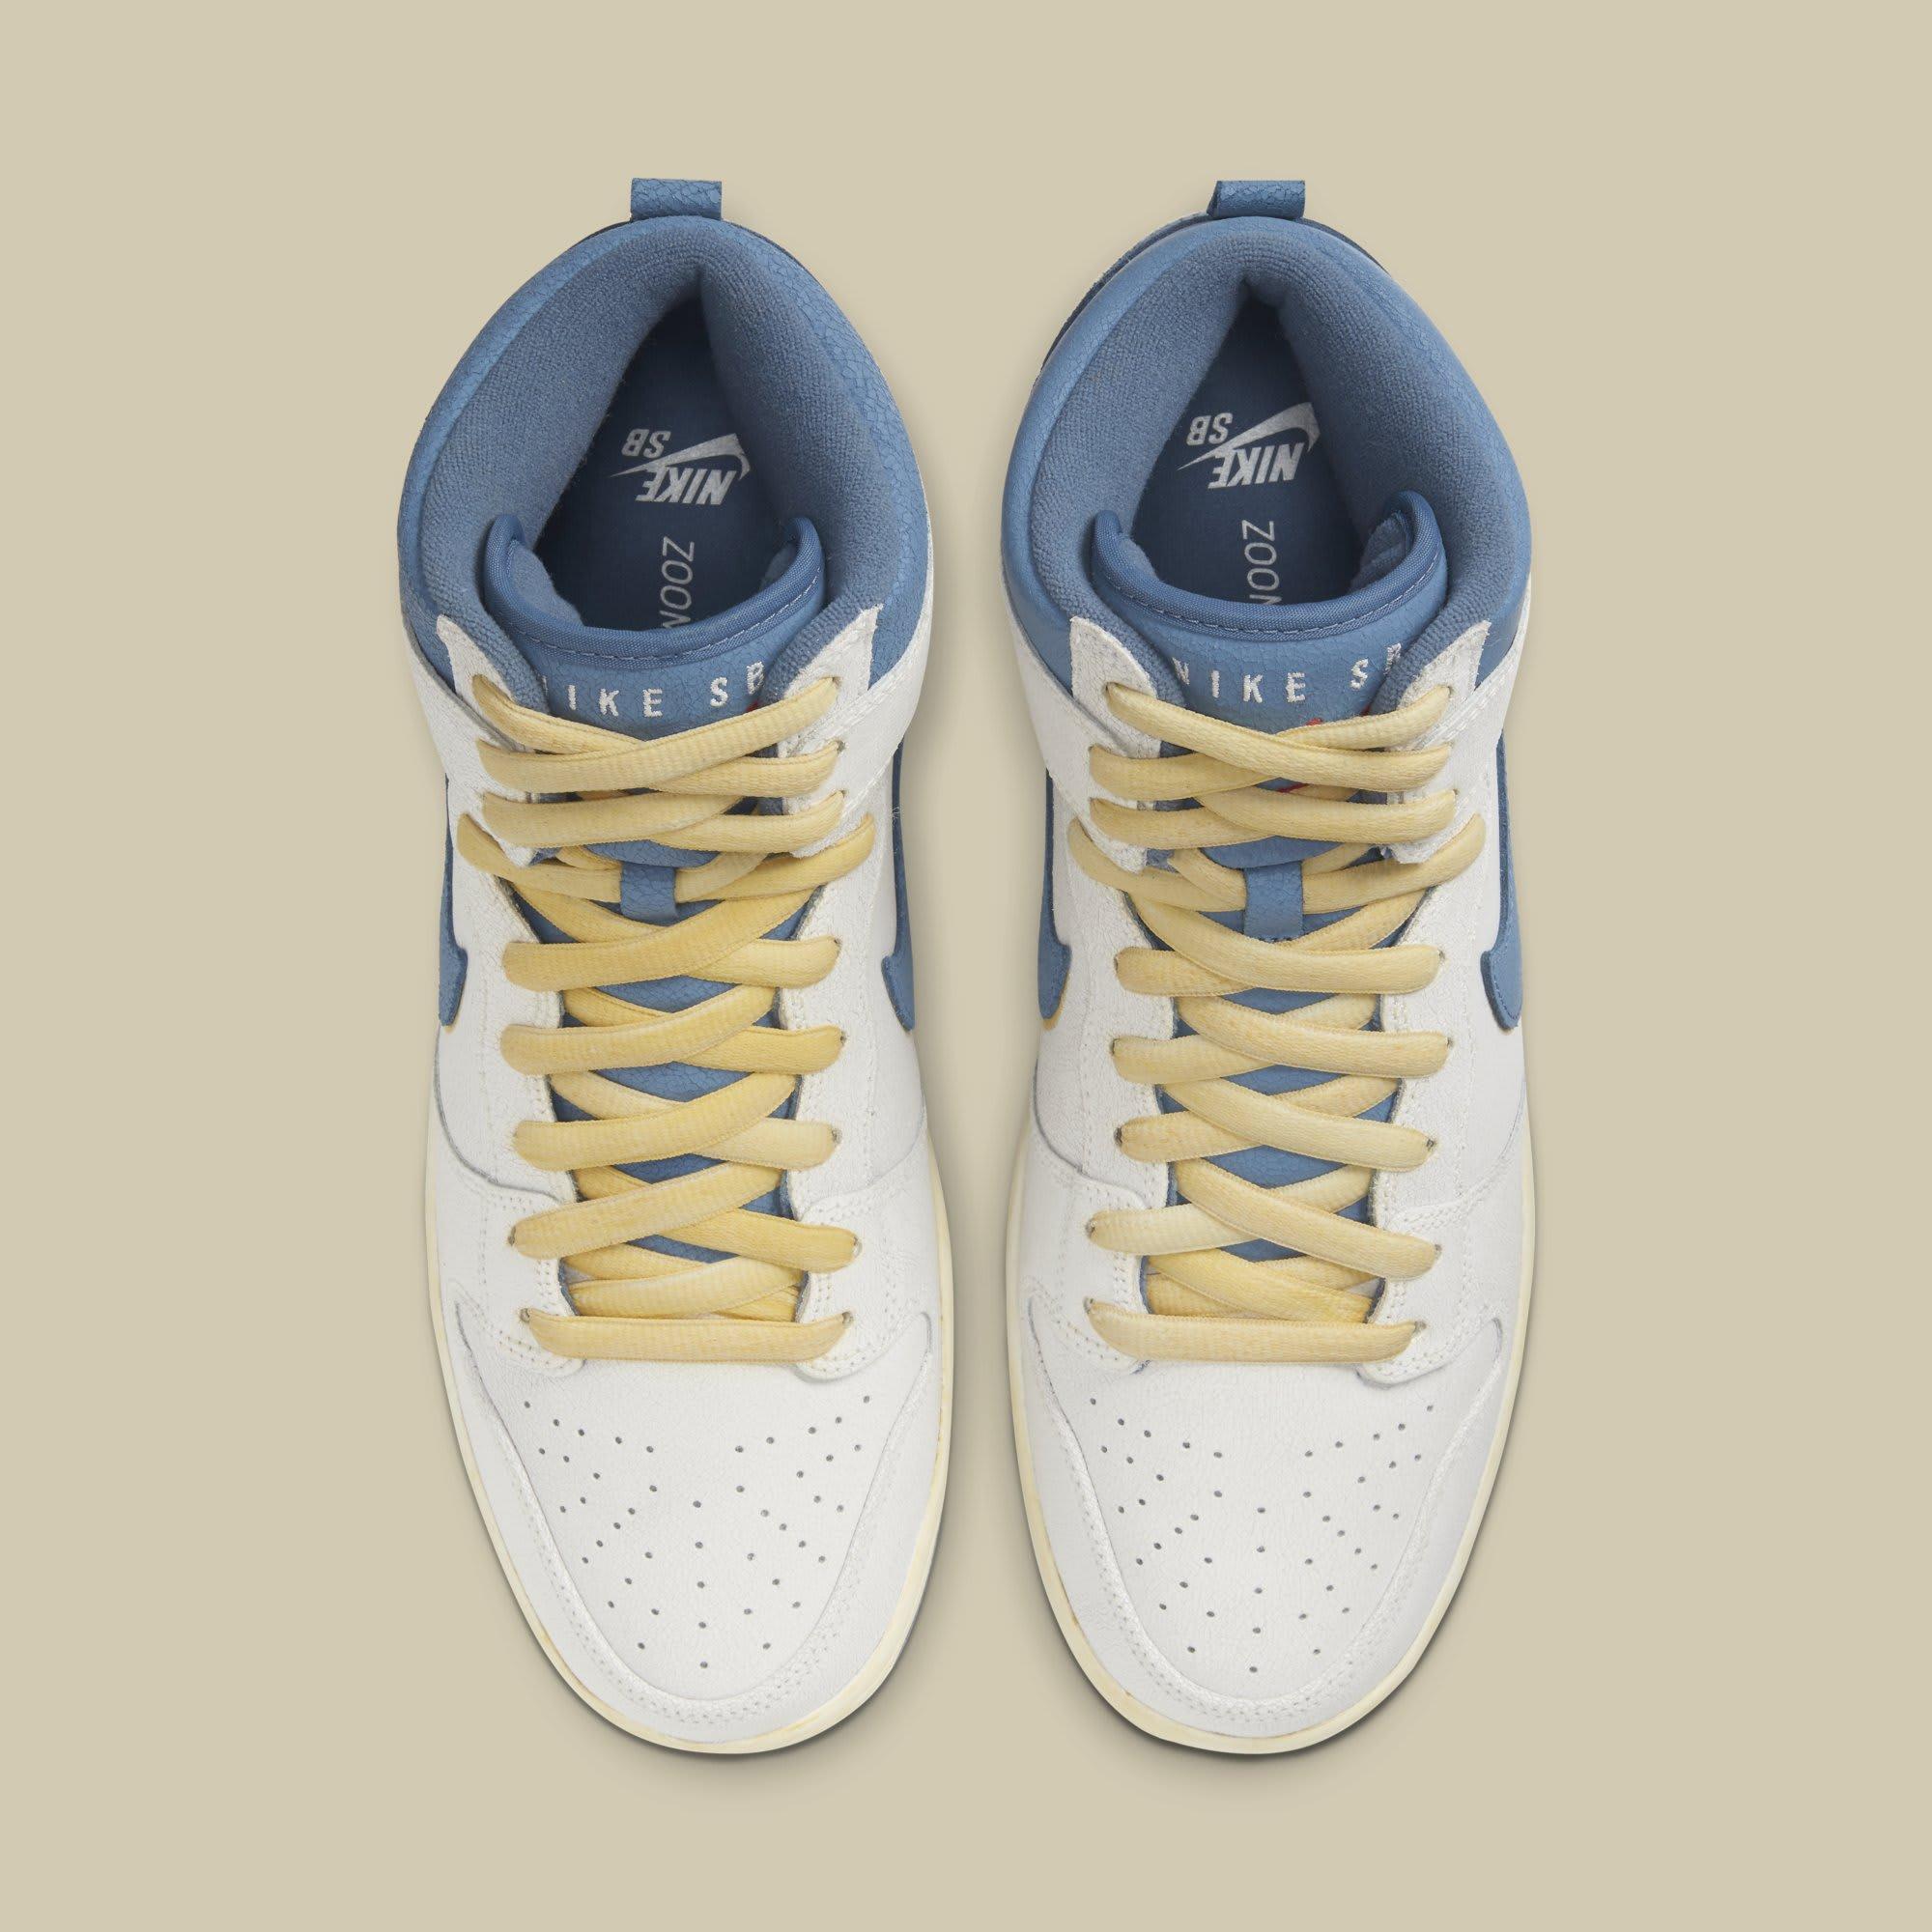 Atlas x Nike SB Dunk High CZ3334-100 Top